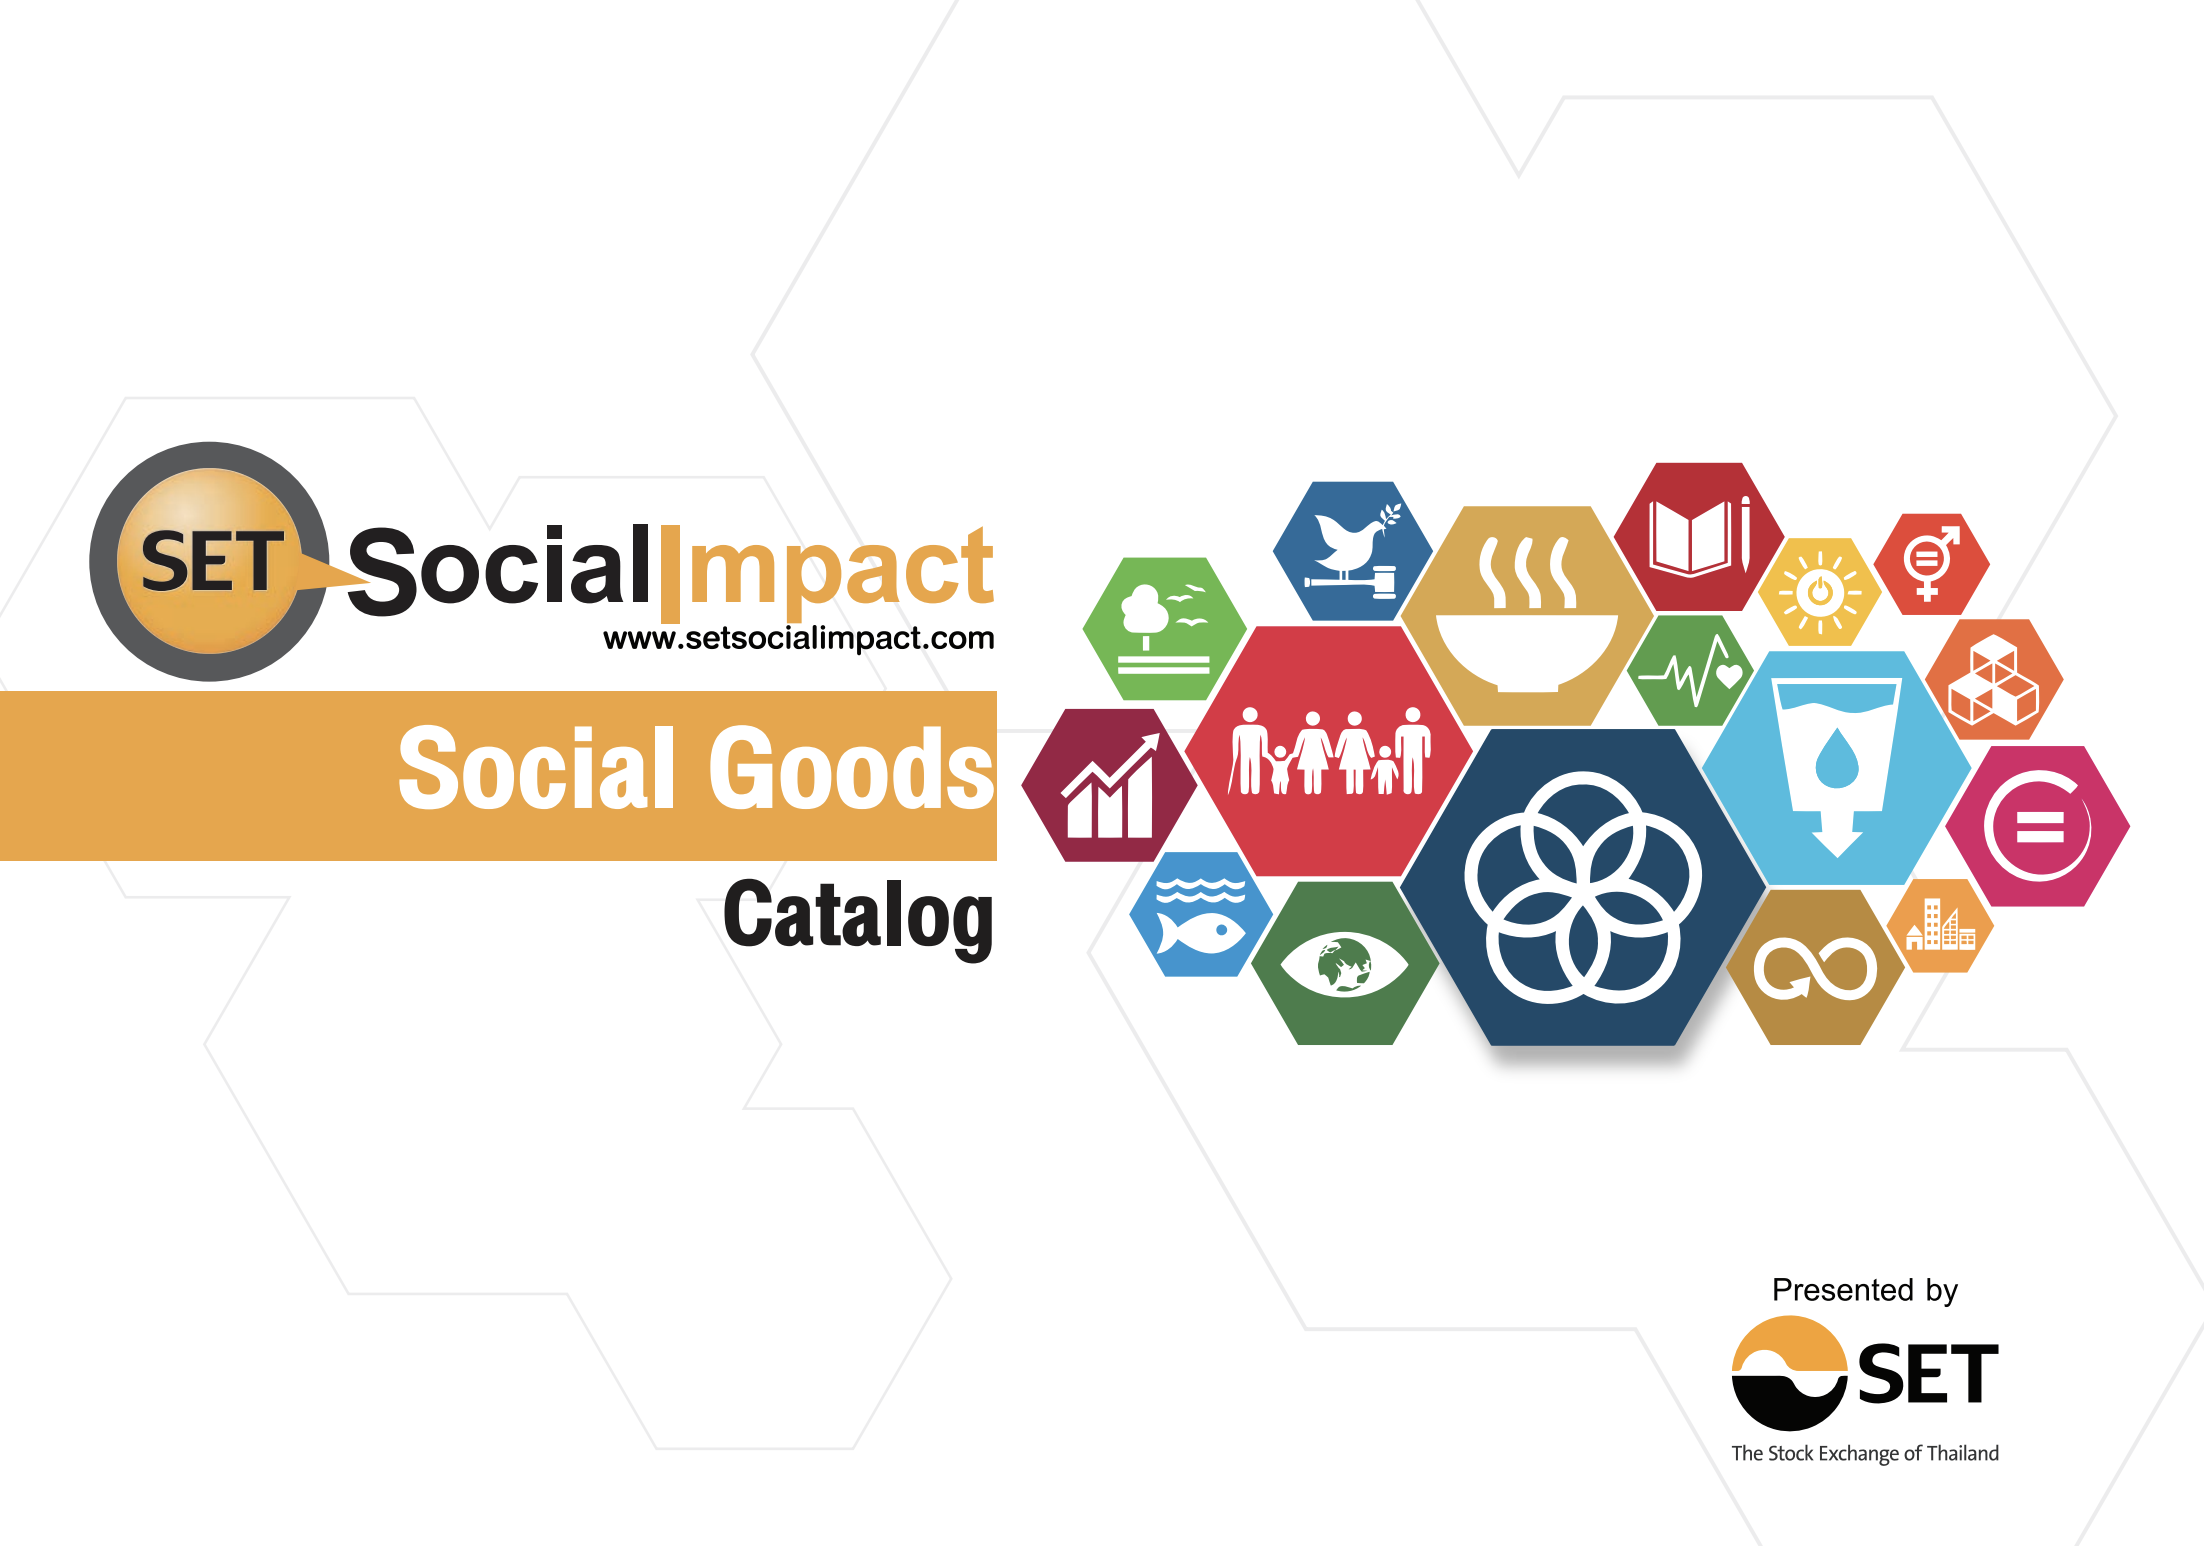 Social Goods Catalog